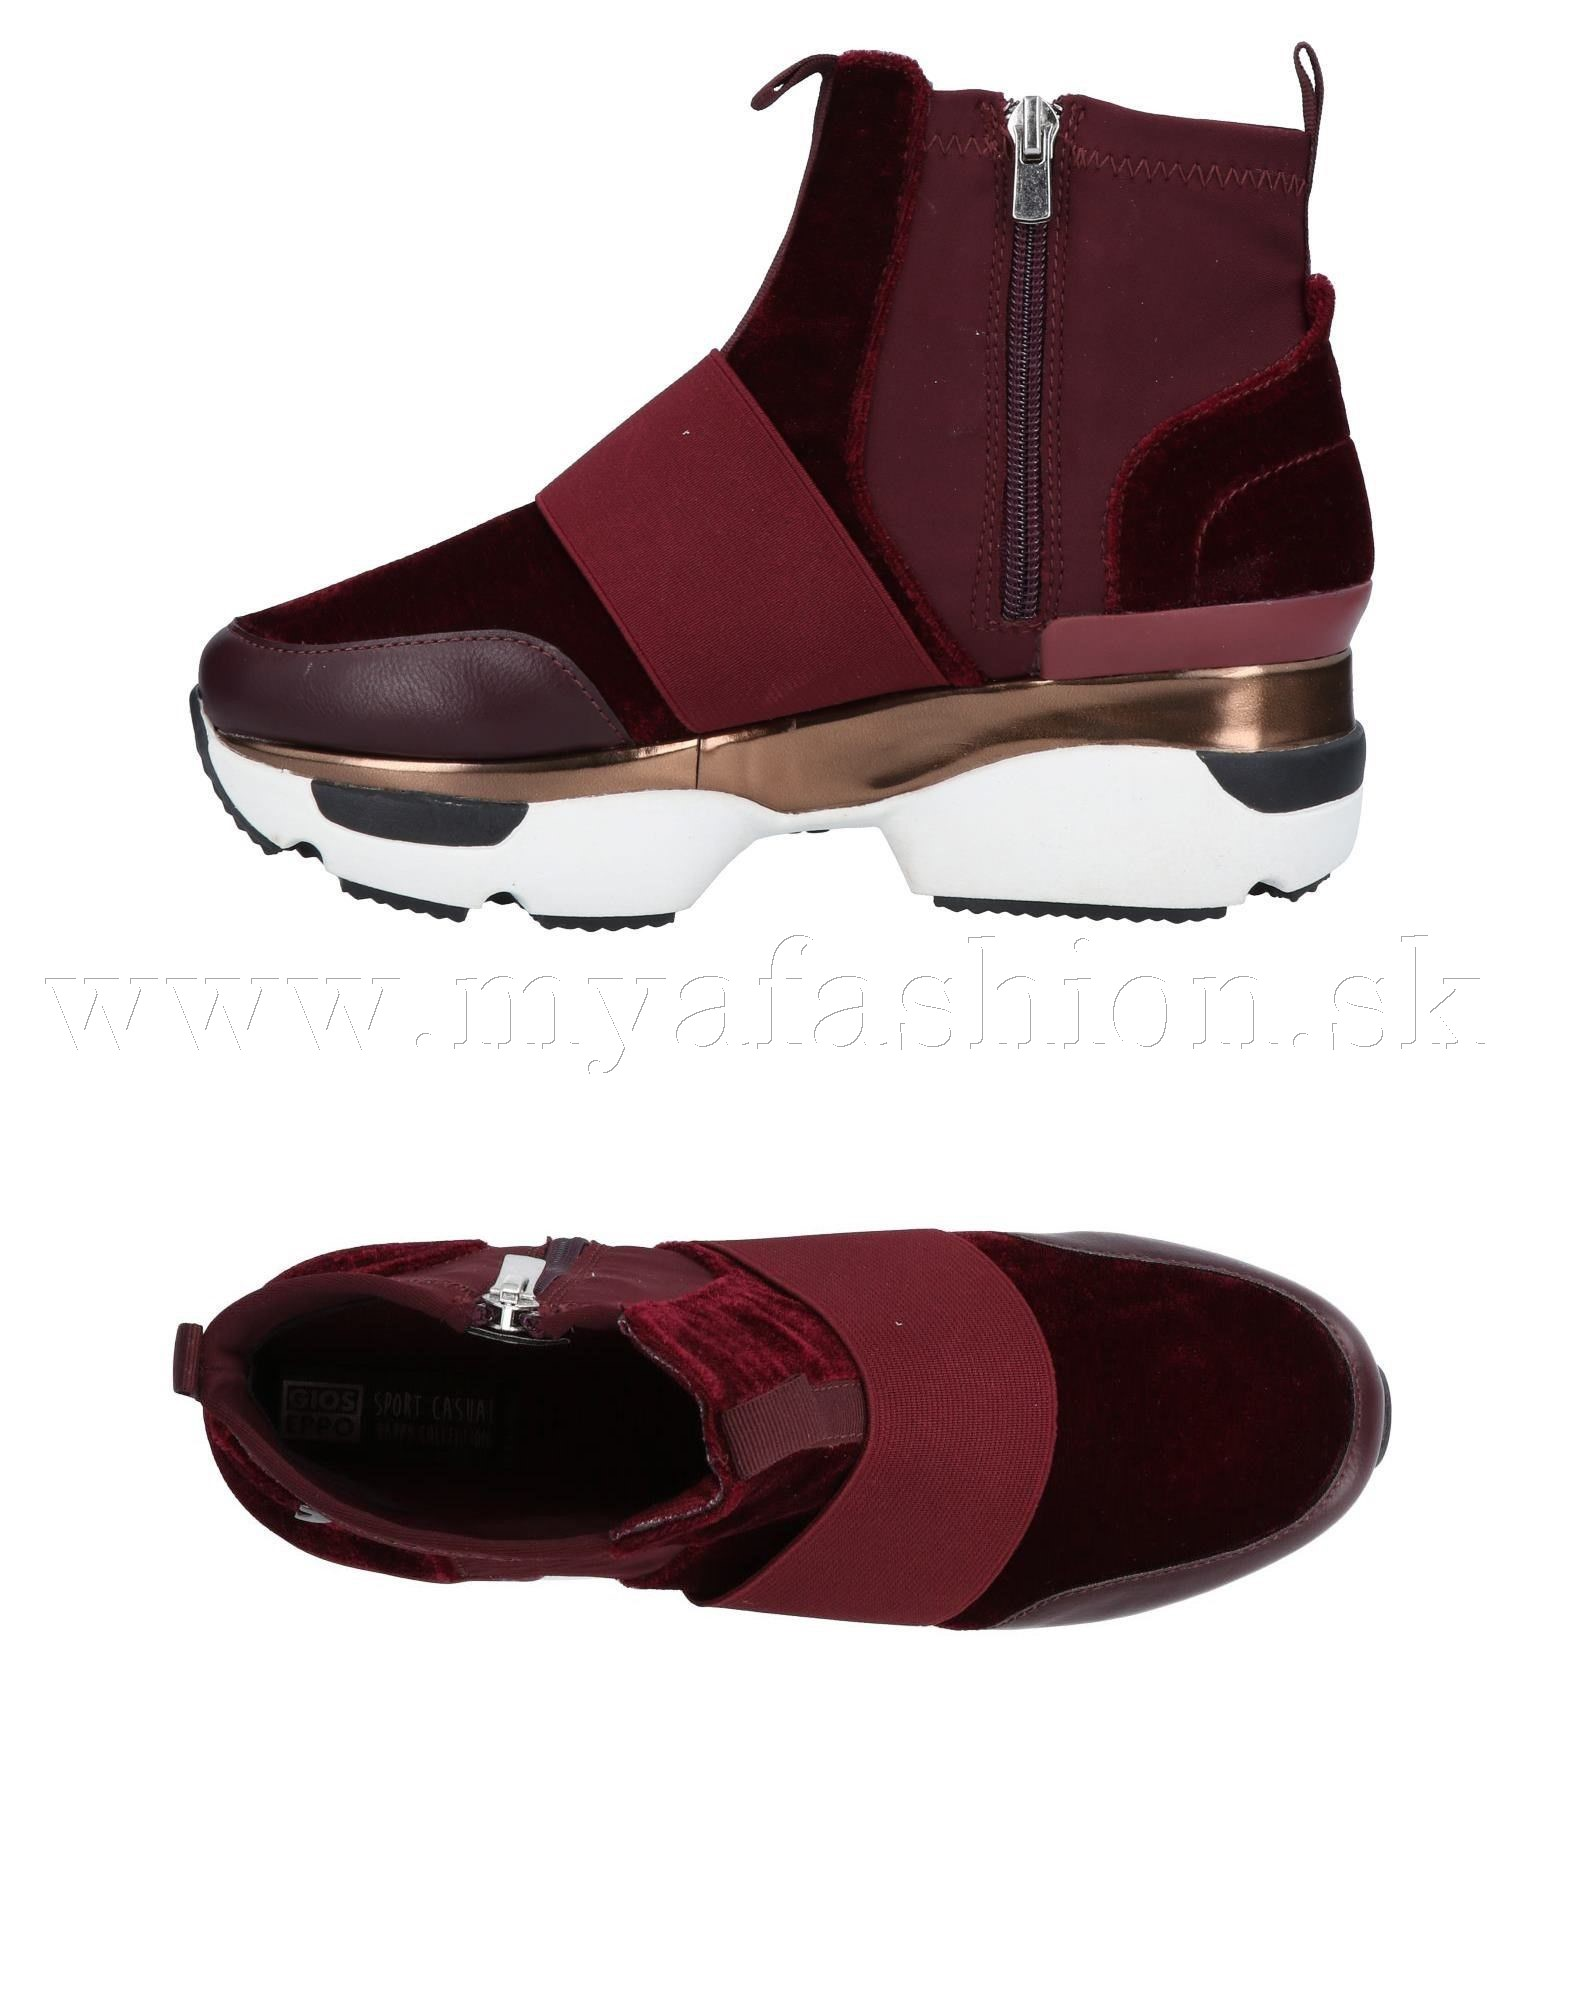 81fdc7fa4e42 Dámske čižmy - dámske bordové členkové topánky na platforme